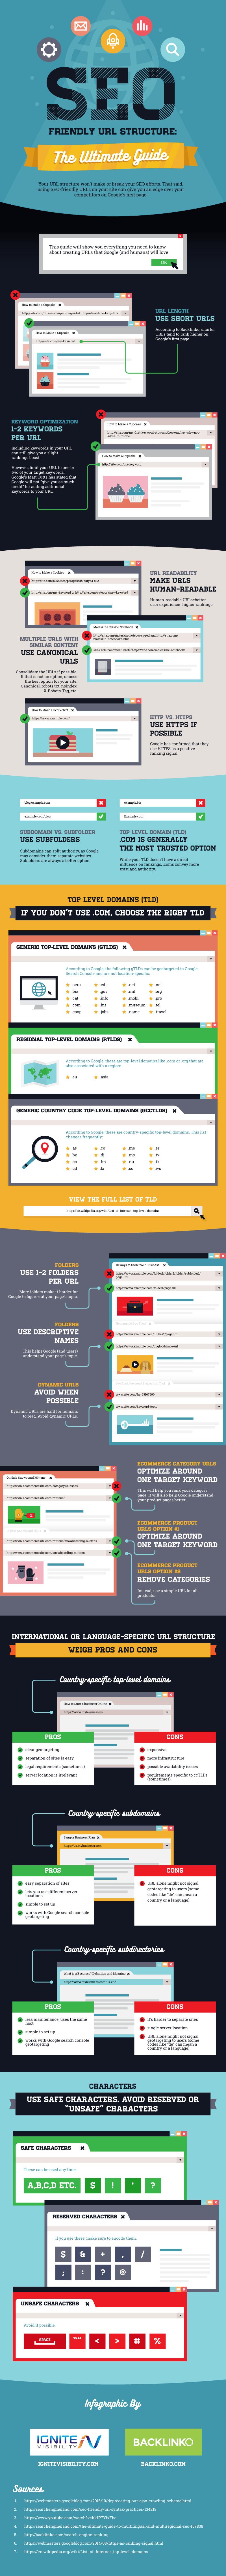 infographie-optimisation-urls-seo